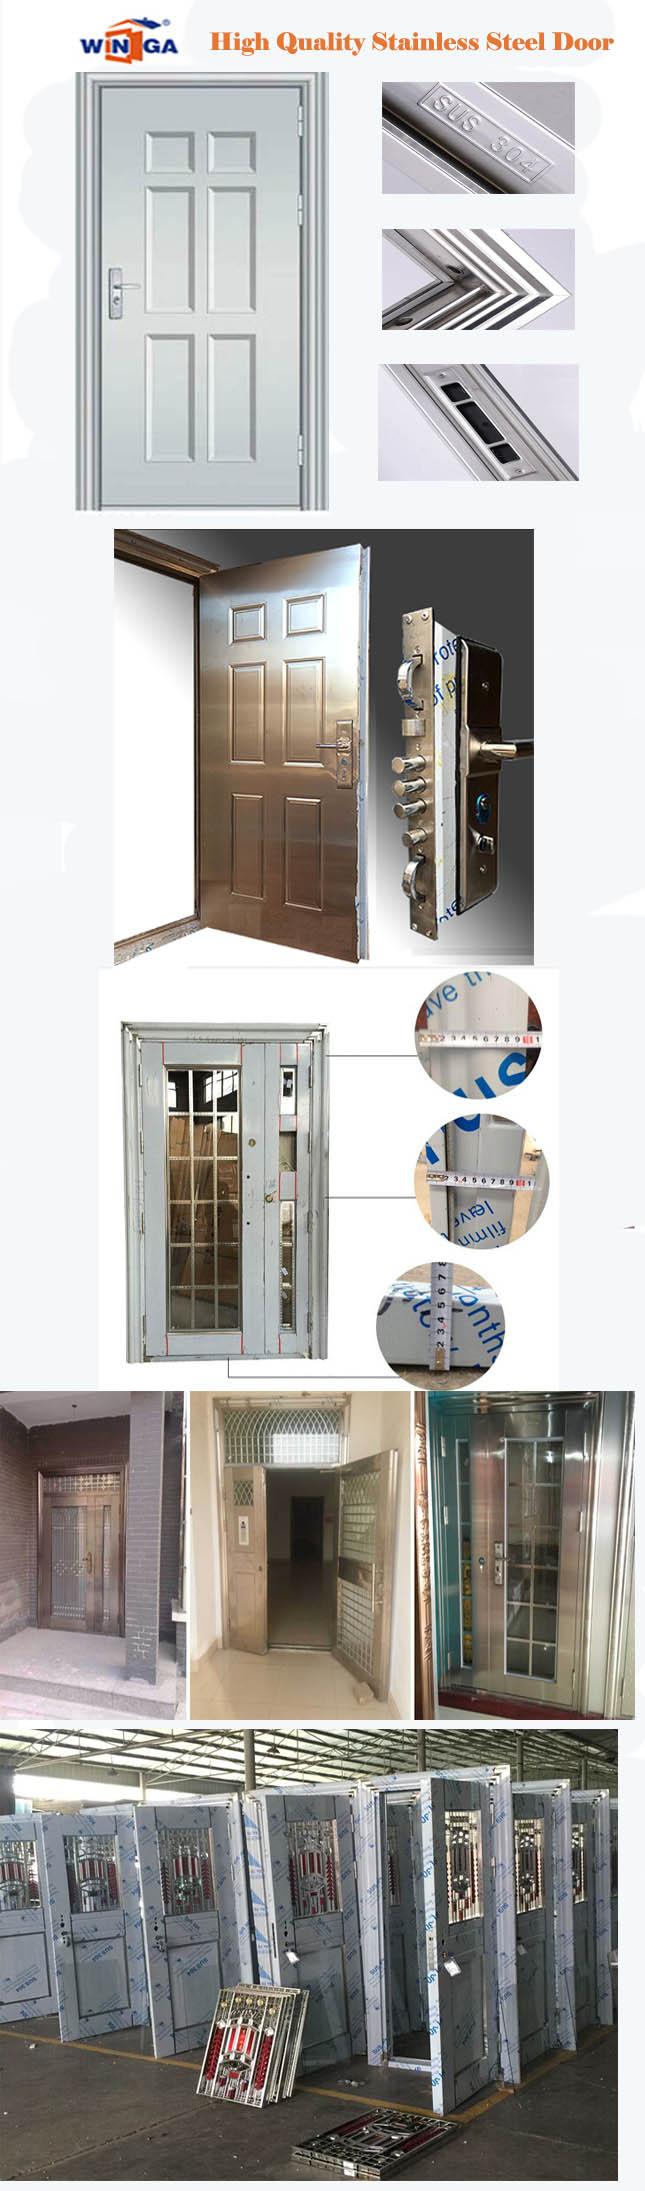 304 Stainless Steel Exterior Outside Sunproof Security Steel Door (W-GH-13)